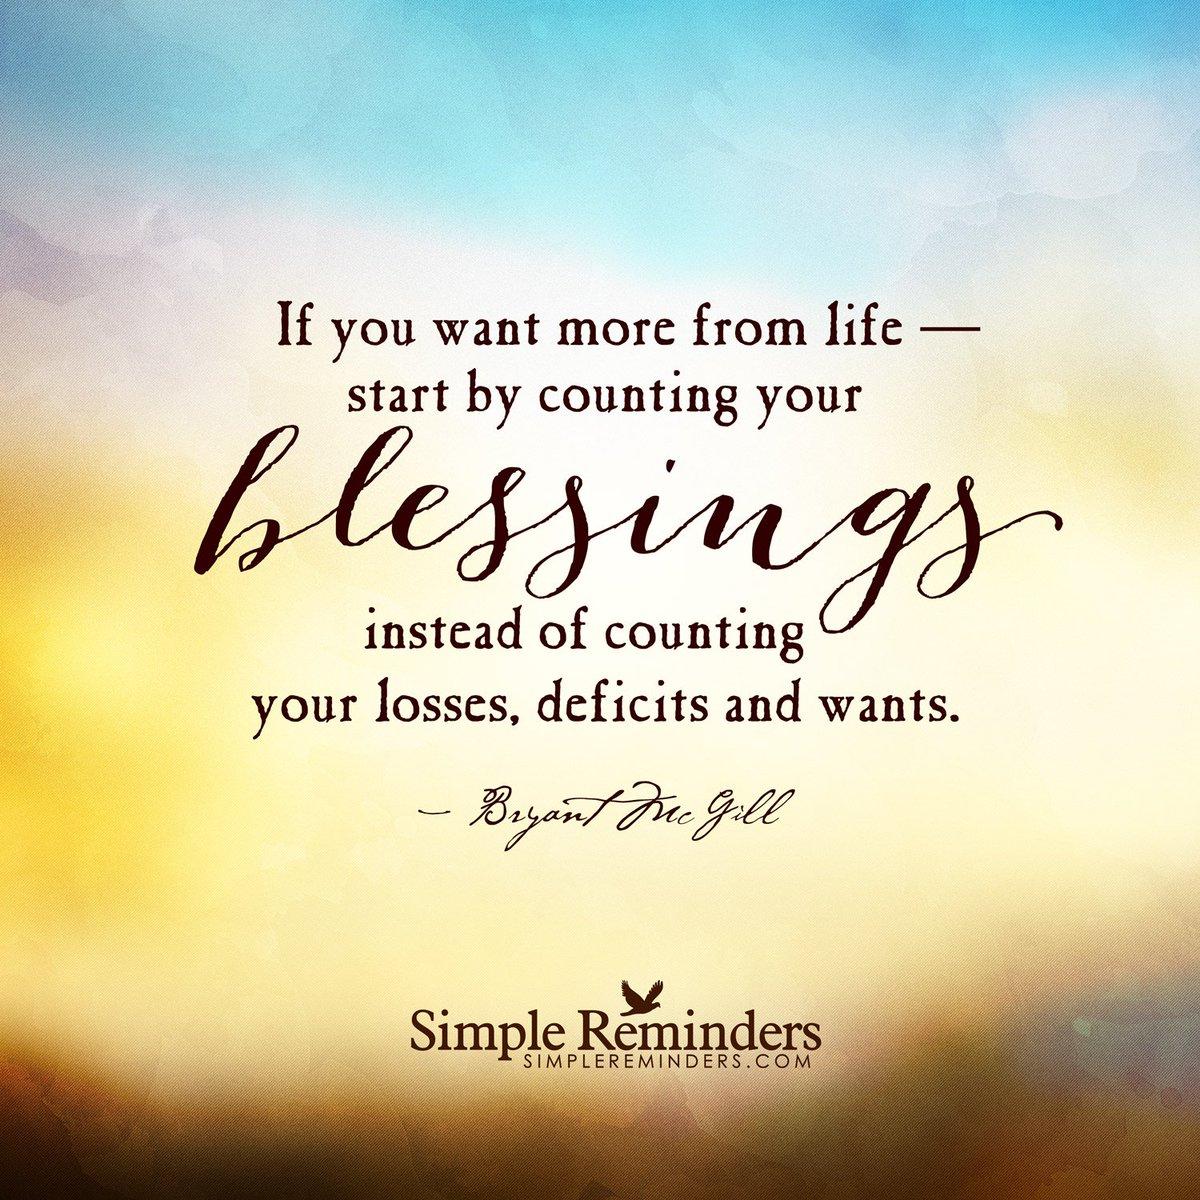 ~ Count Your Blessings ~ https://t.co/hO75XMrEvB